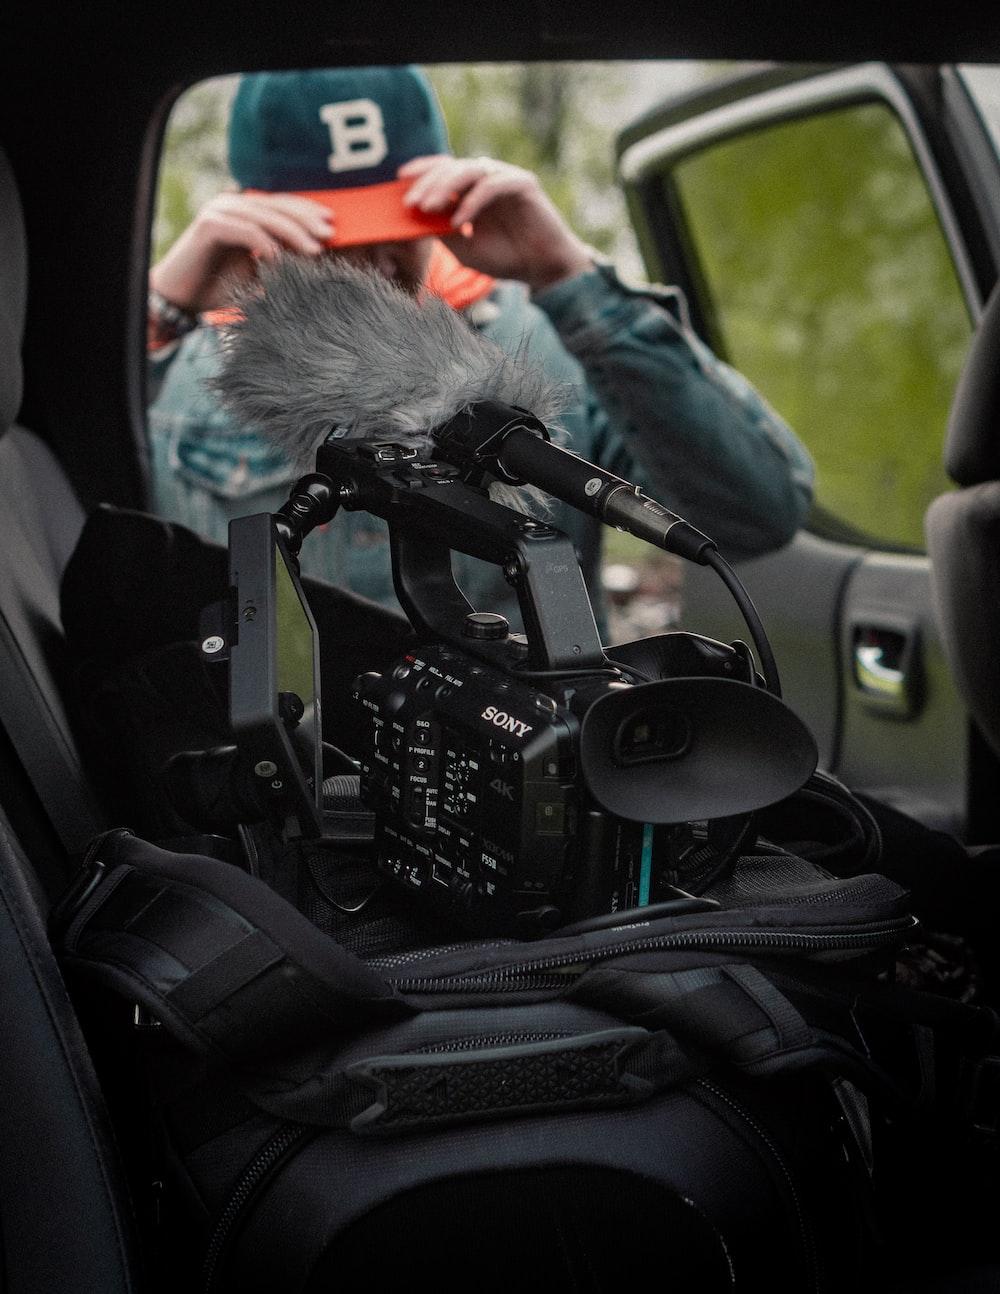 black video camera inside the vehicle